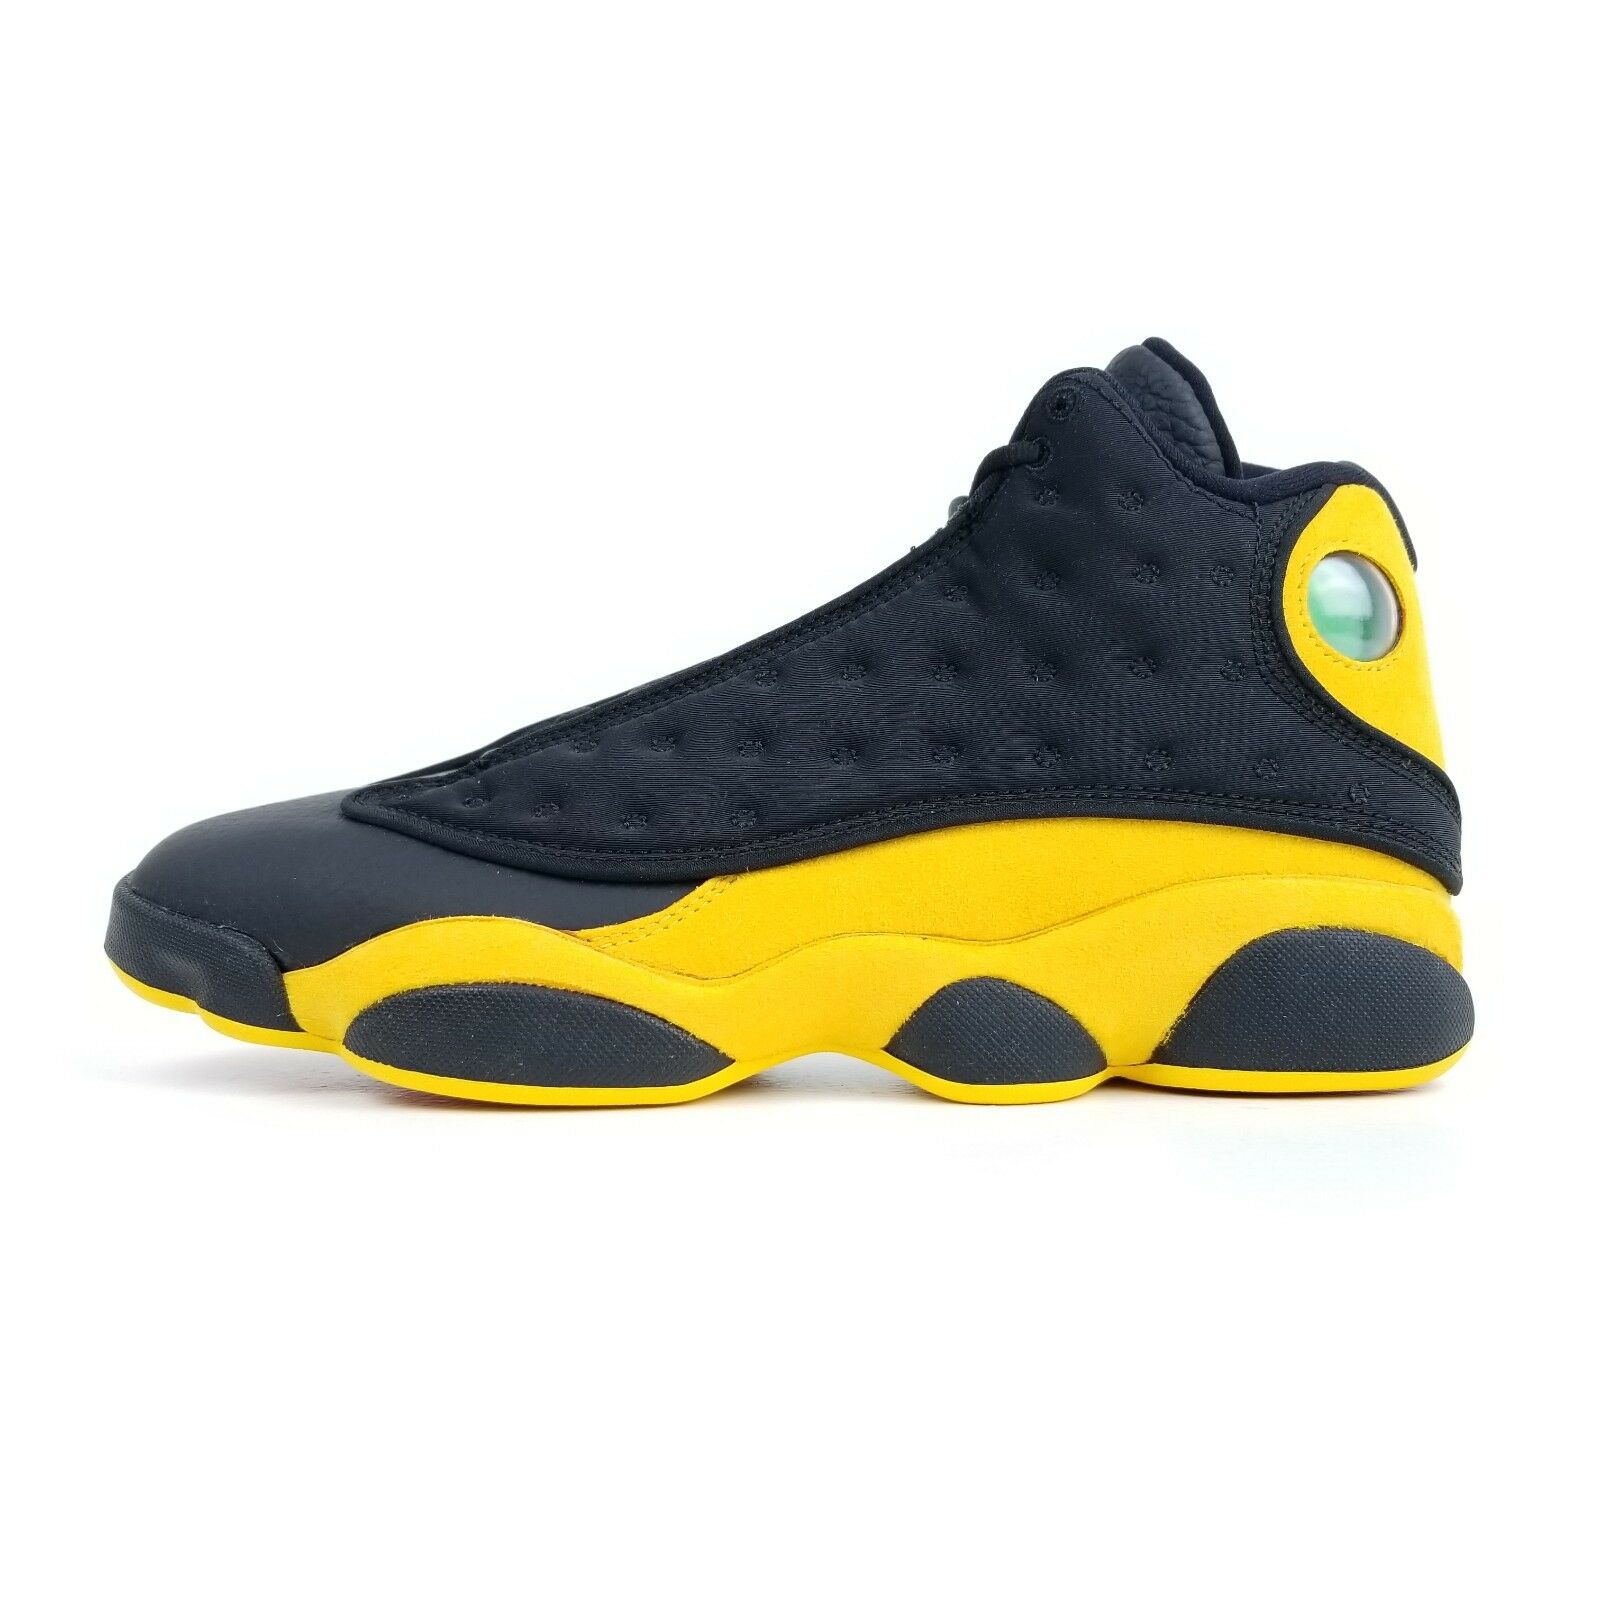 a21e54608106ea NEW Nike Shox SE JCRD Mens shoes Green Pulse Electric Sz 11 Running RARE  CAMO. NIKE Air Jordan XIII 13 Retro Graduation Melo Black ...